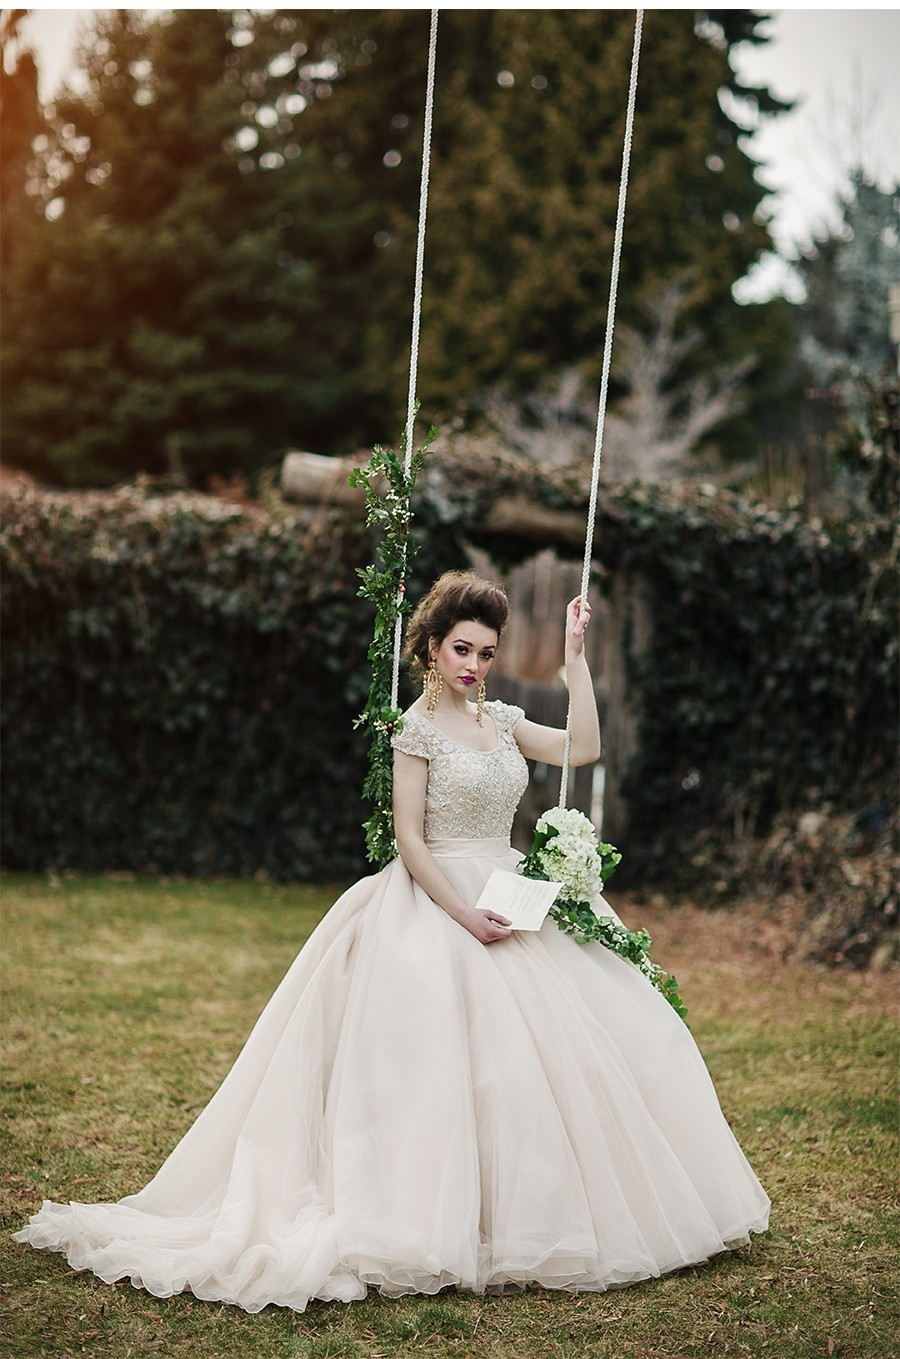 Autumn Vestido De Noiva White/Ivory Vintage Beaded Scoop Short Sleeves Bridal Wedding Dresses 2016